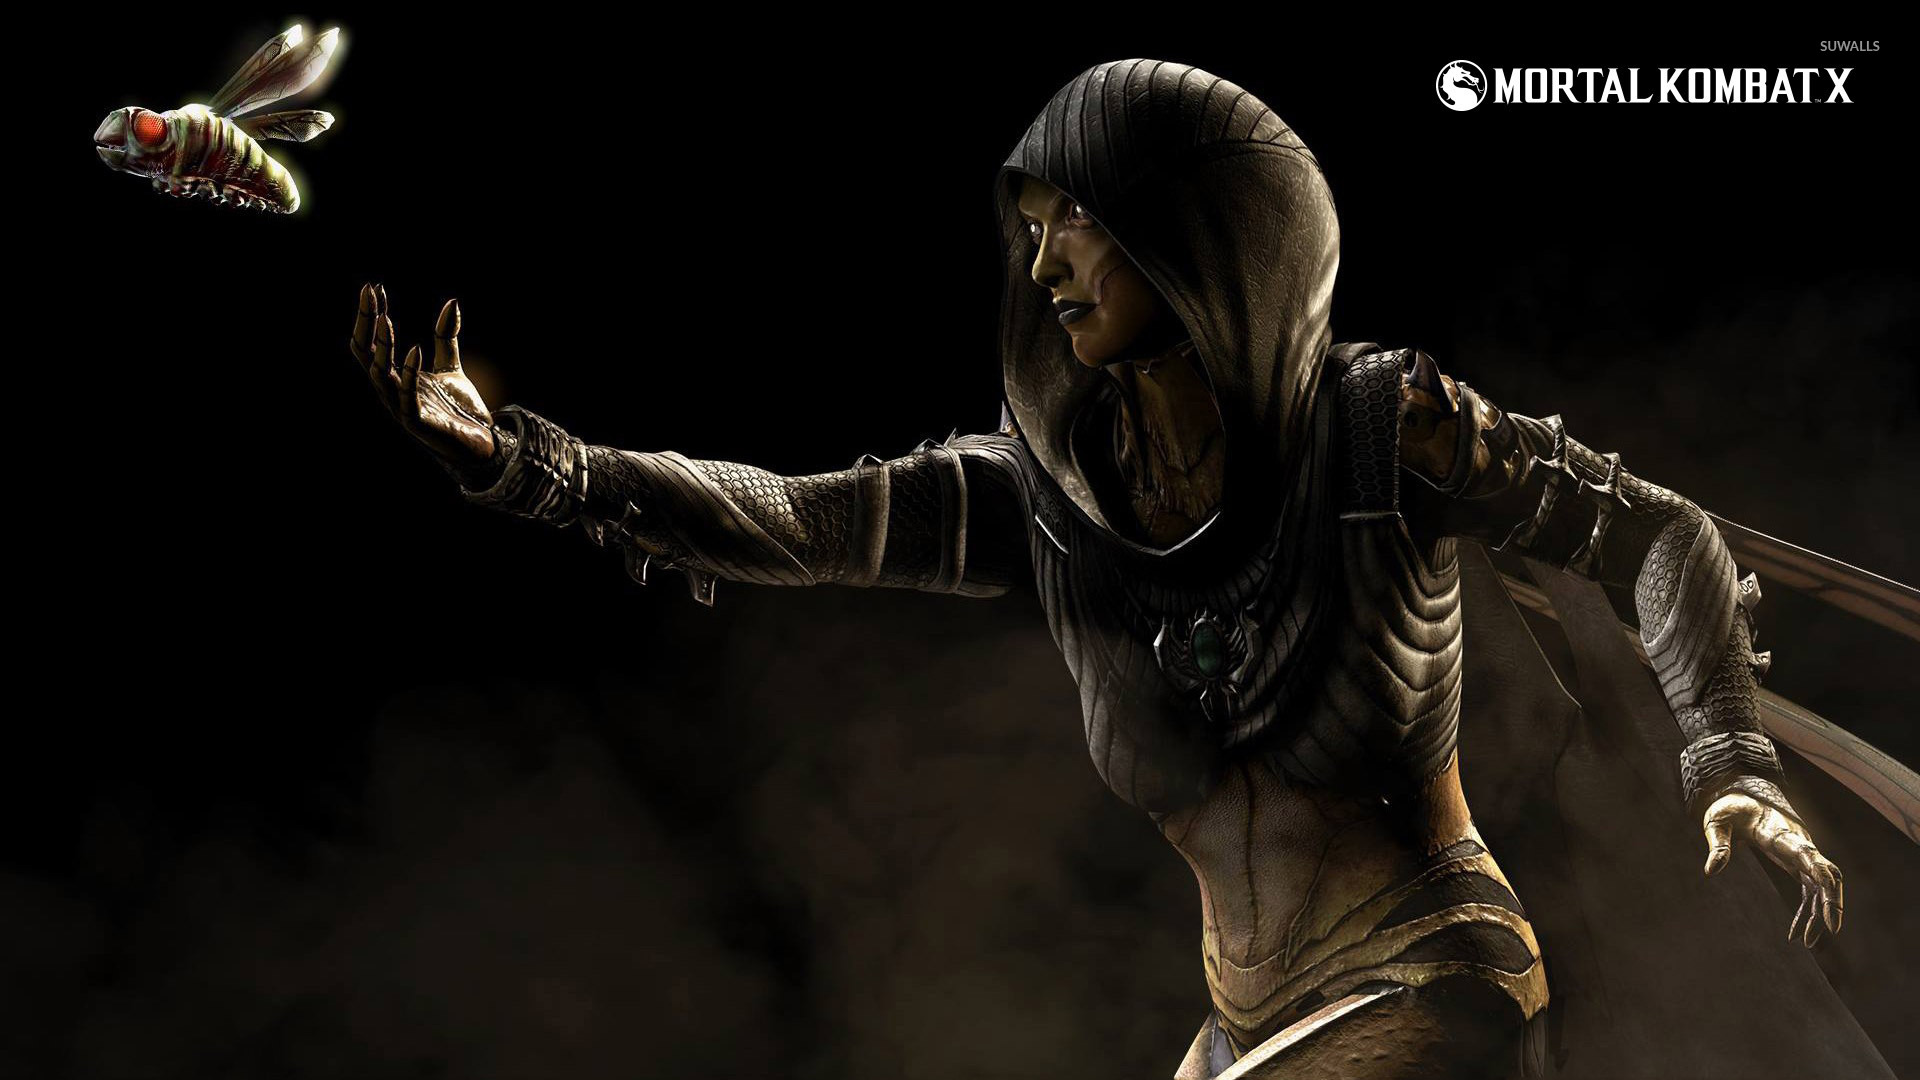 Mortal Kombat X Wallpapers: Mortal Kombat X Wallpaper